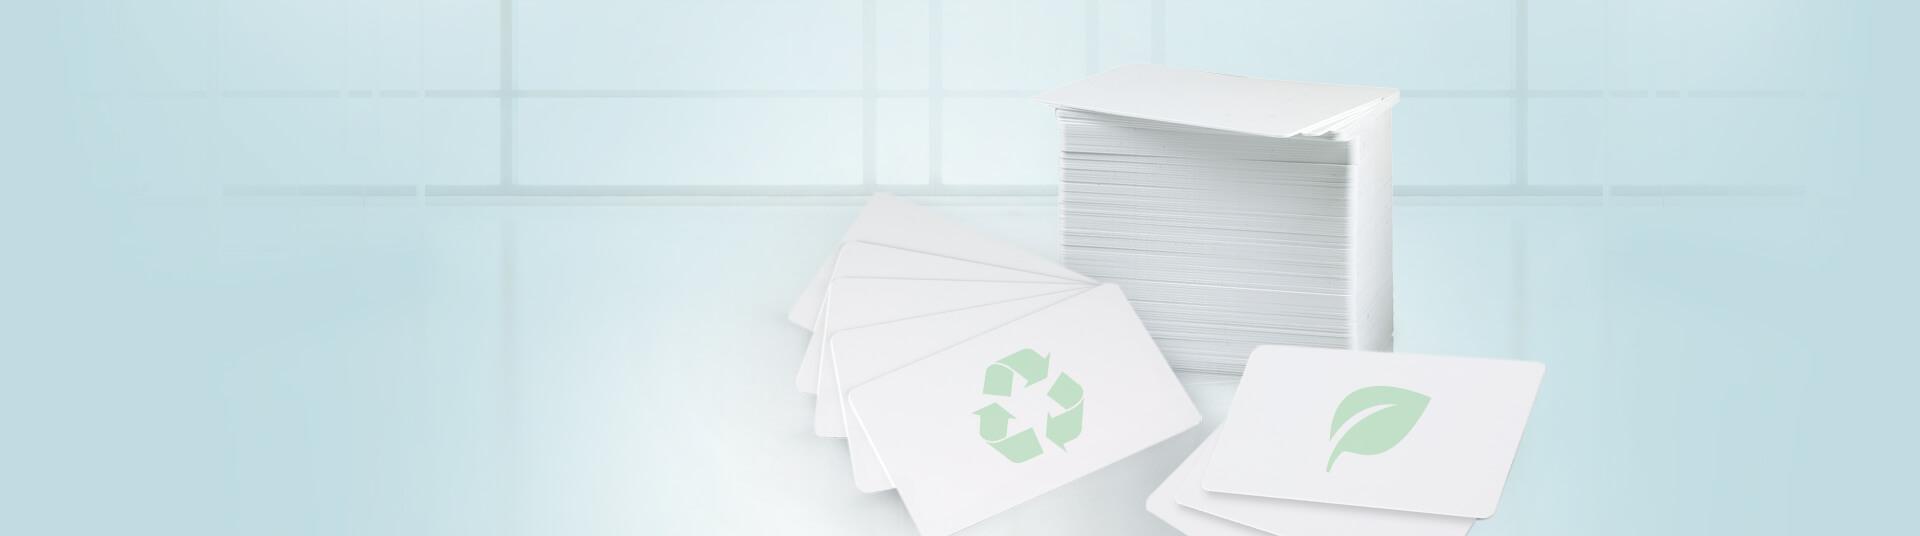 Standard Blank Cards